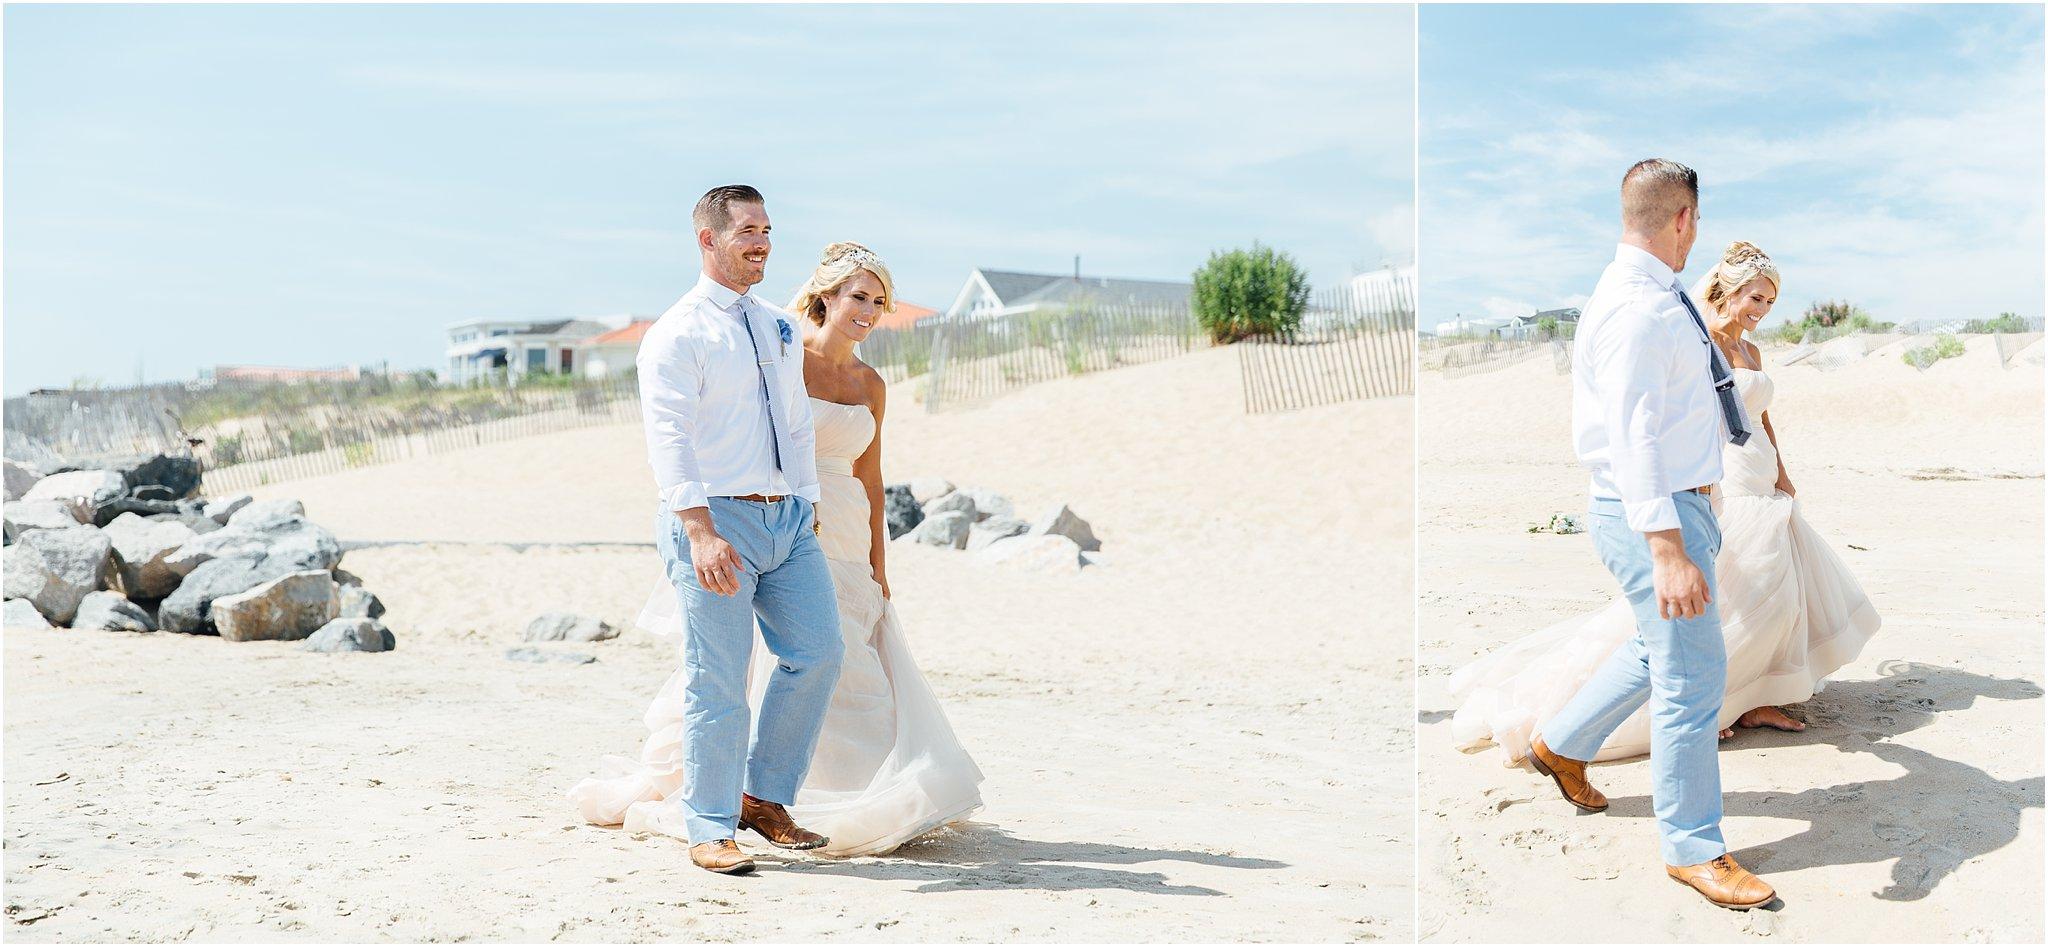 jessica_ryan_photography_virginia_beach_water_tabe_wedding_vera_wang_wedding_dress_0630